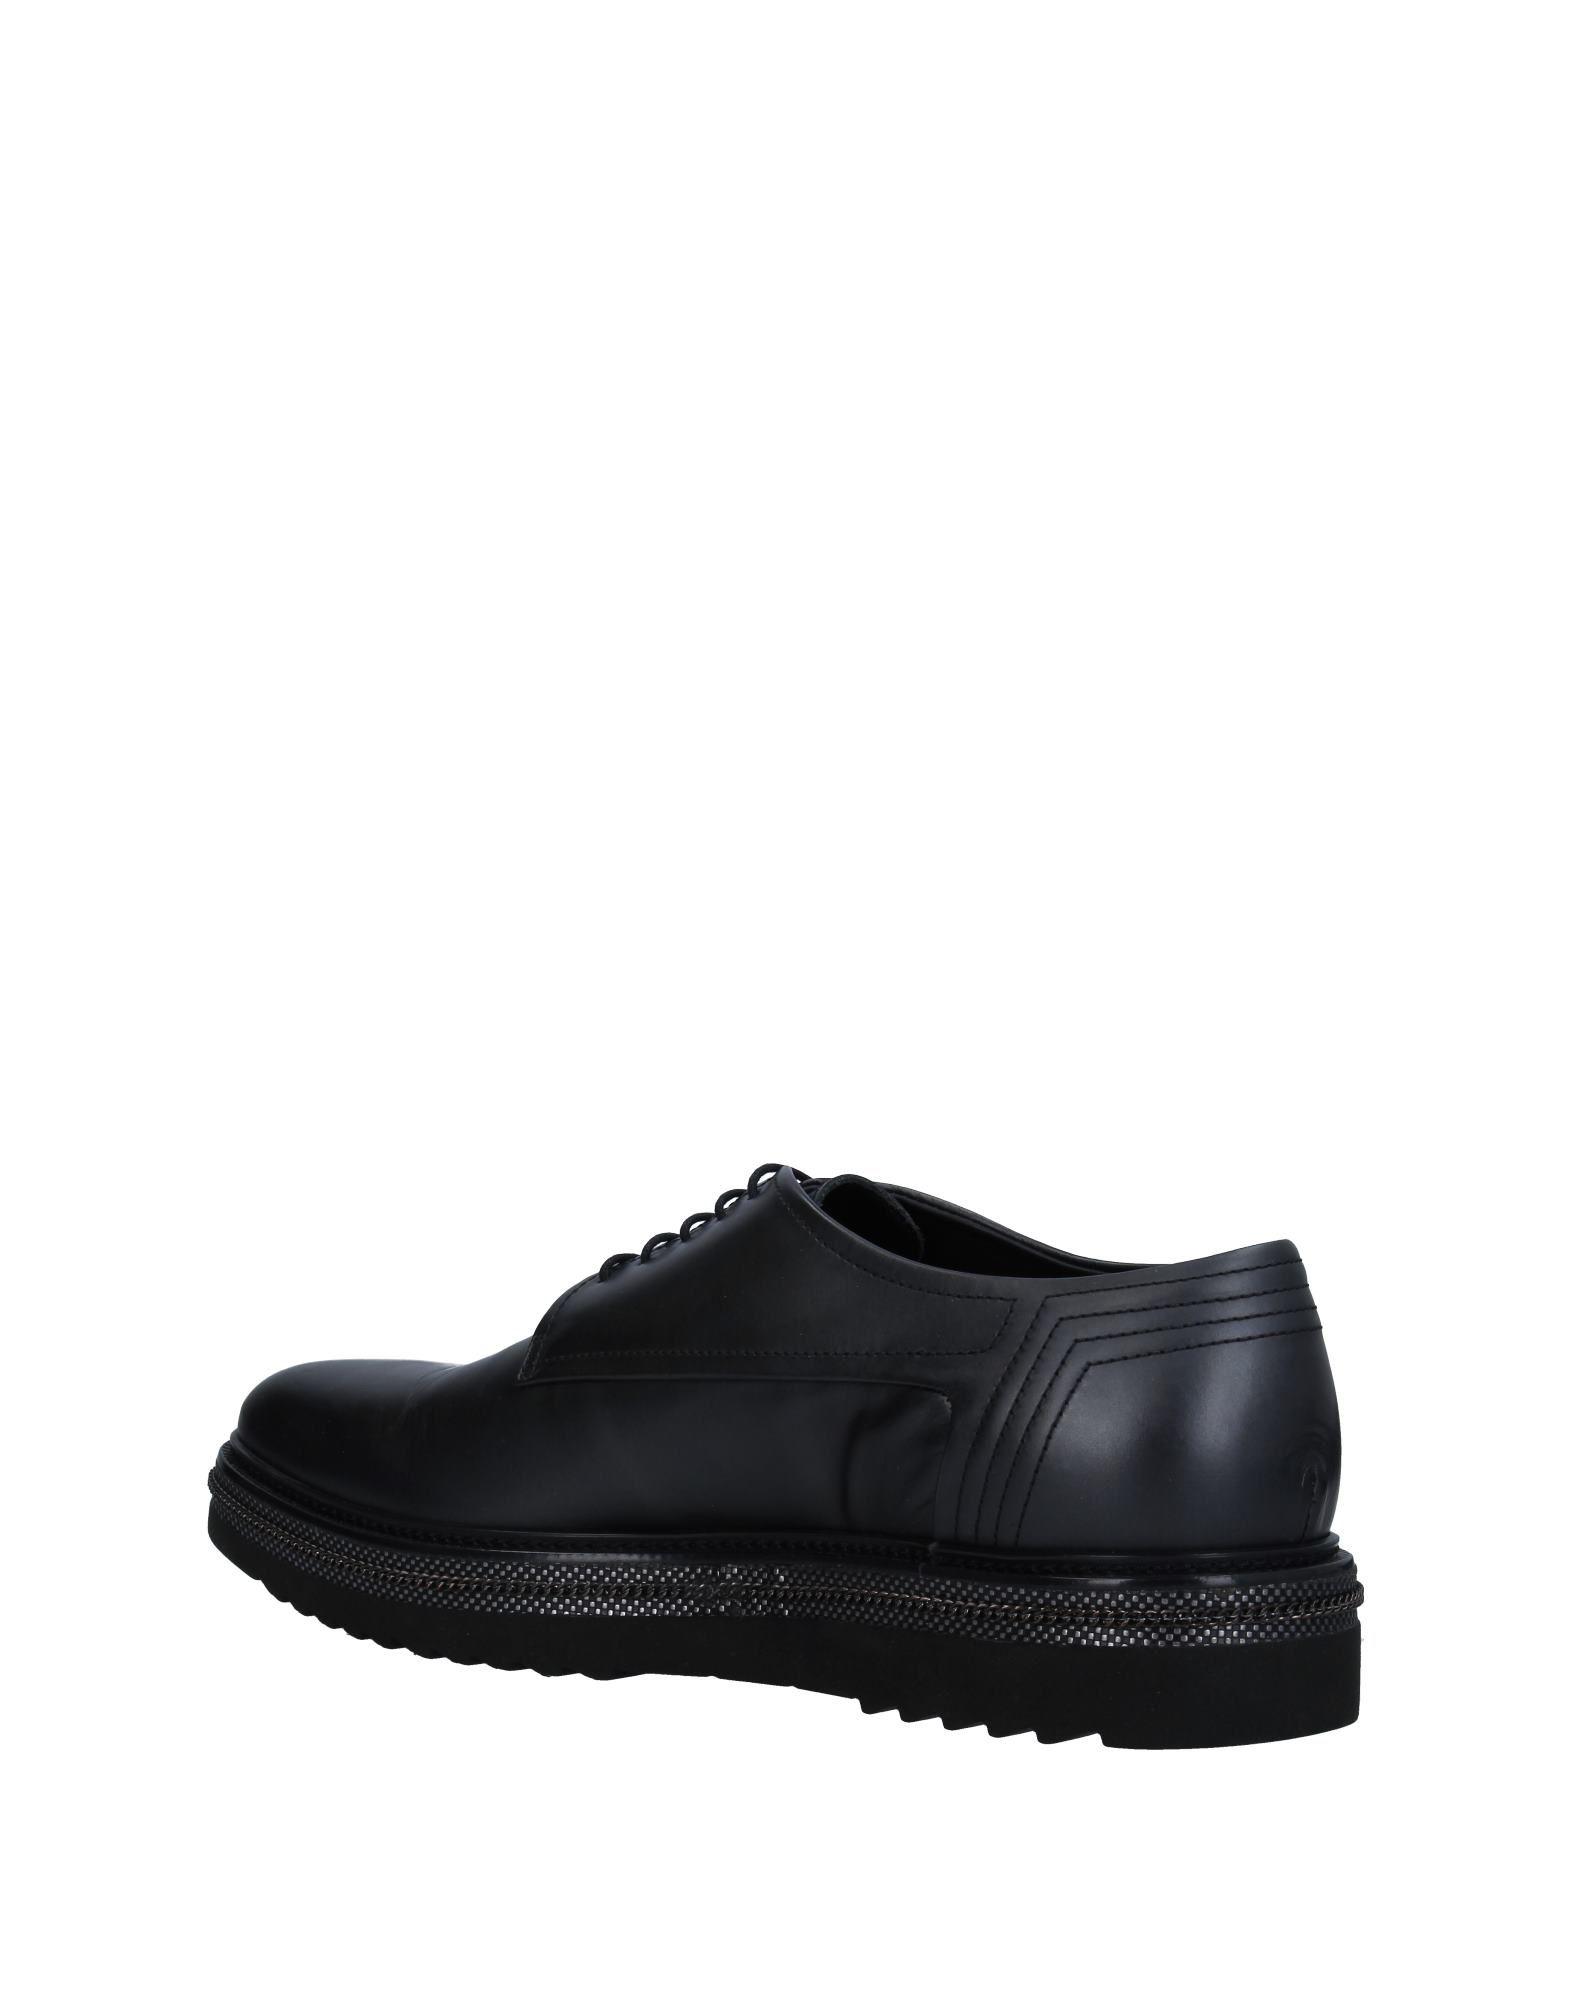 Chaussures À Lacets Alberto Guardiani Femme - Chaussures À Lacets Alberto Guardiani sur